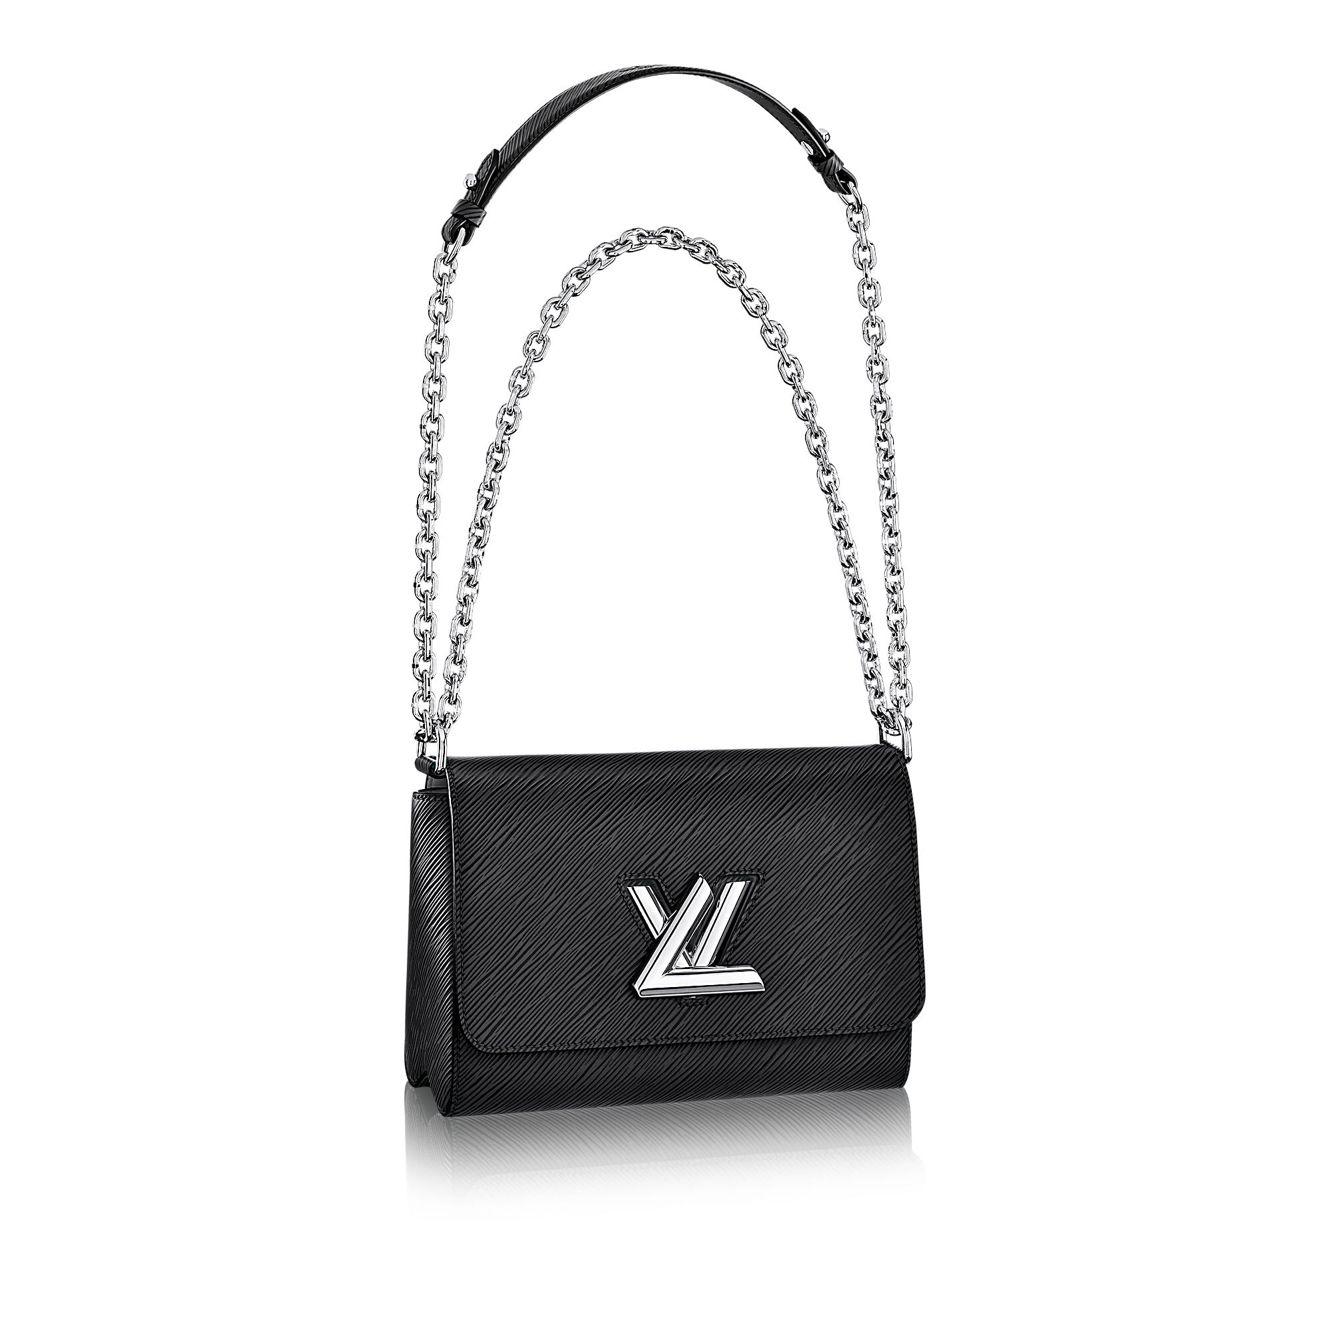 Louis Vuitton Twist MM Bag